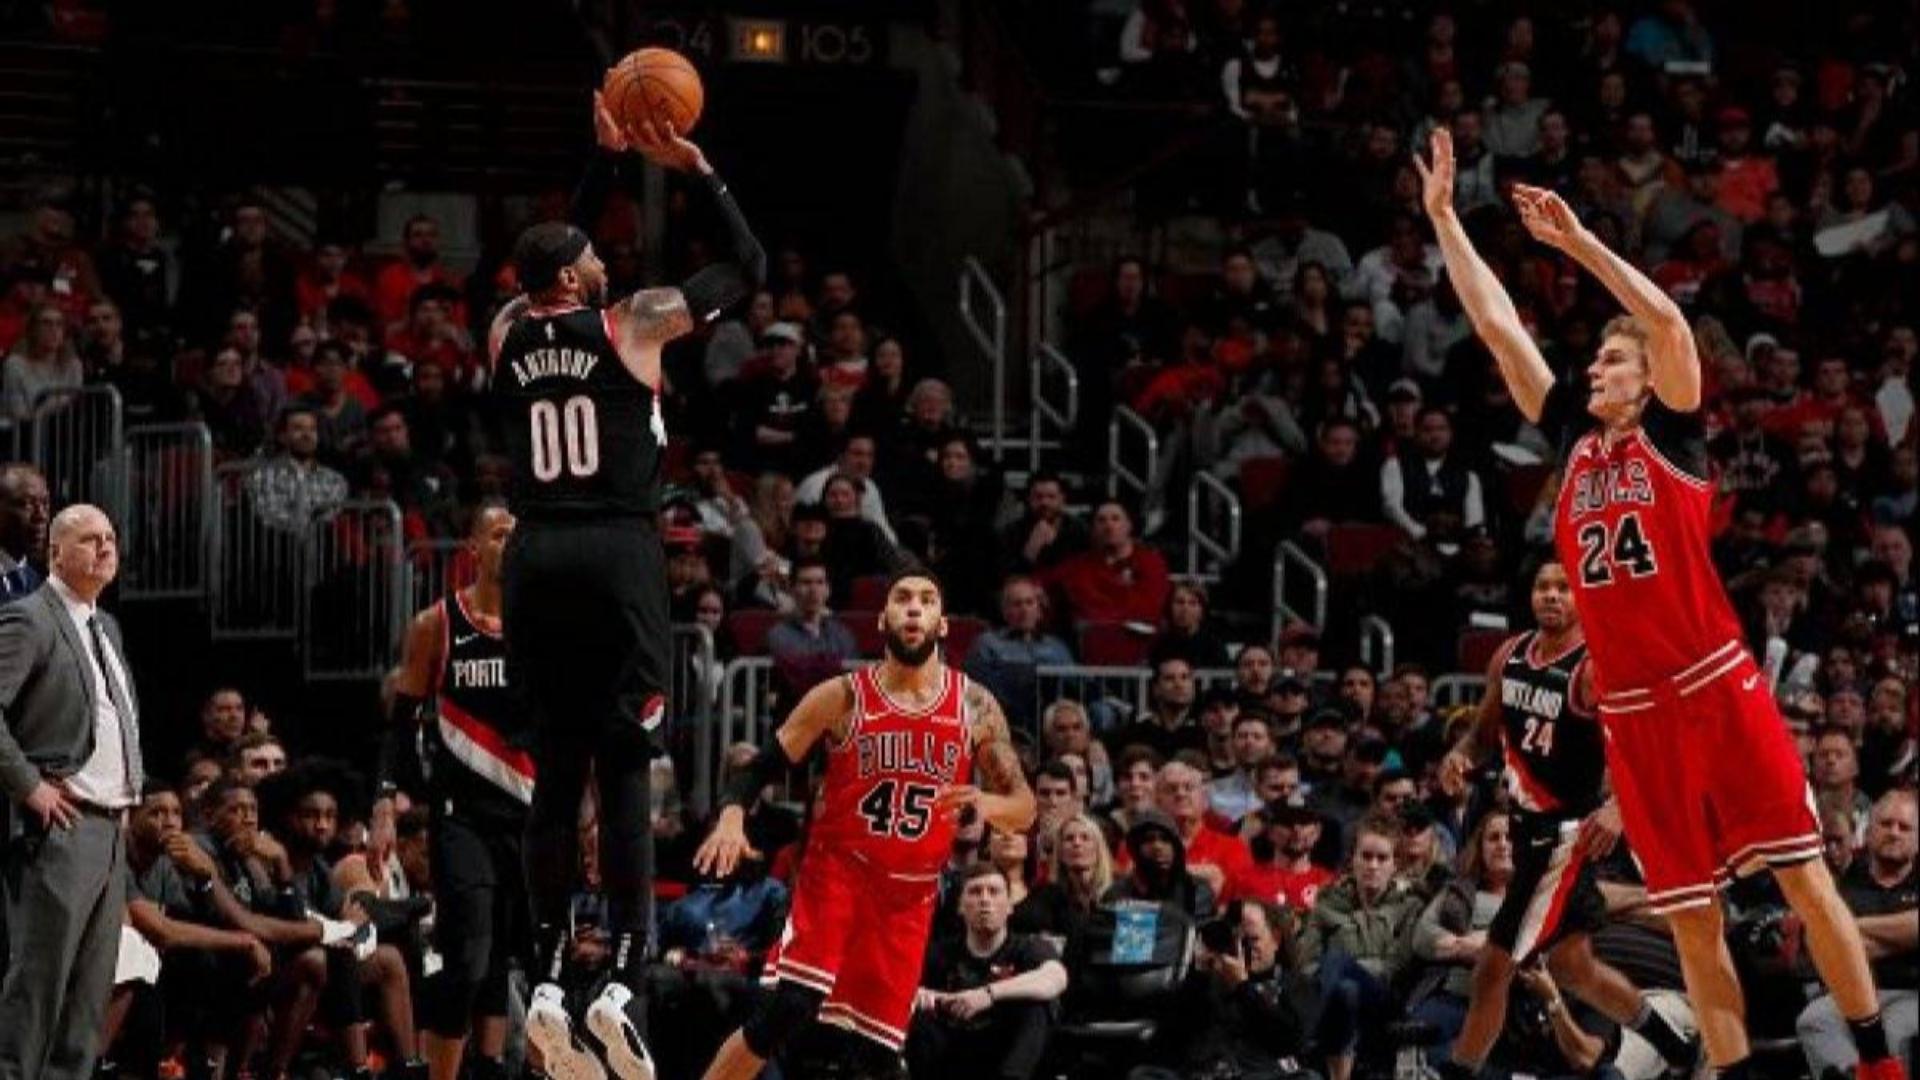 2019-2020 NBA常规赛 芝加哥公牛 VS 波特兰开拓者 集锦Part1